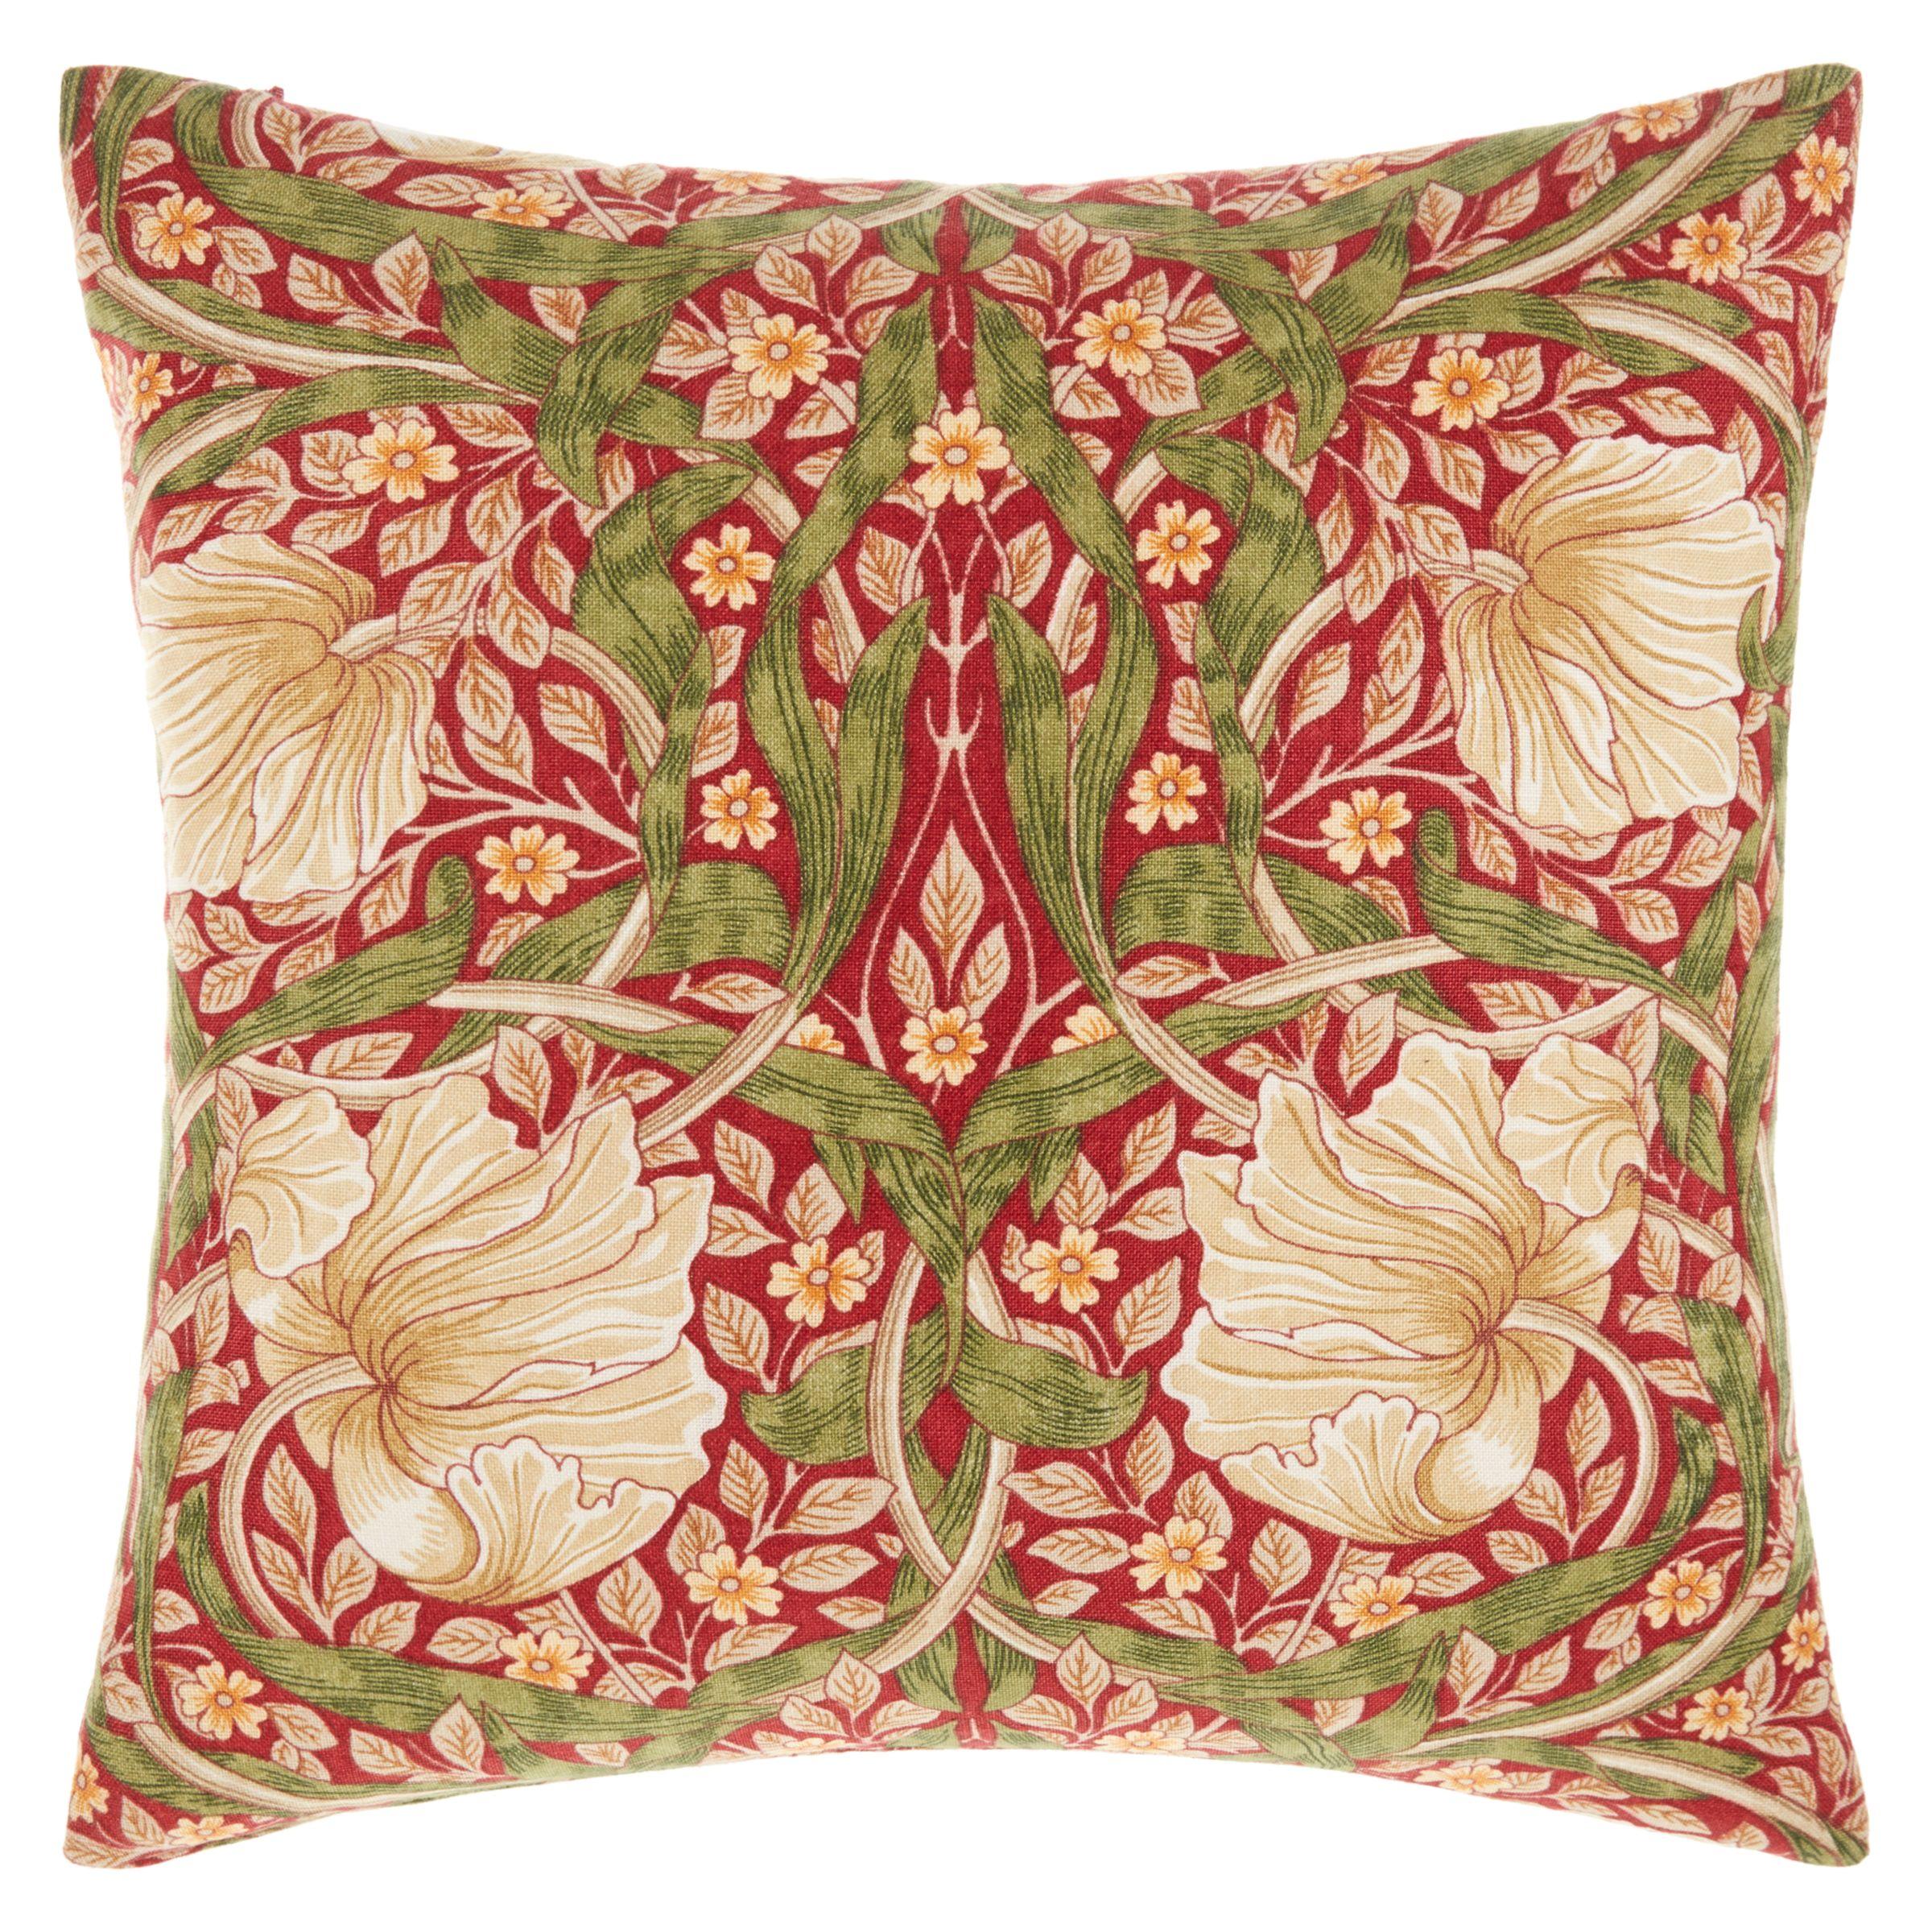 Morris & Co Morris & Co Pimpernel Cushion, Red